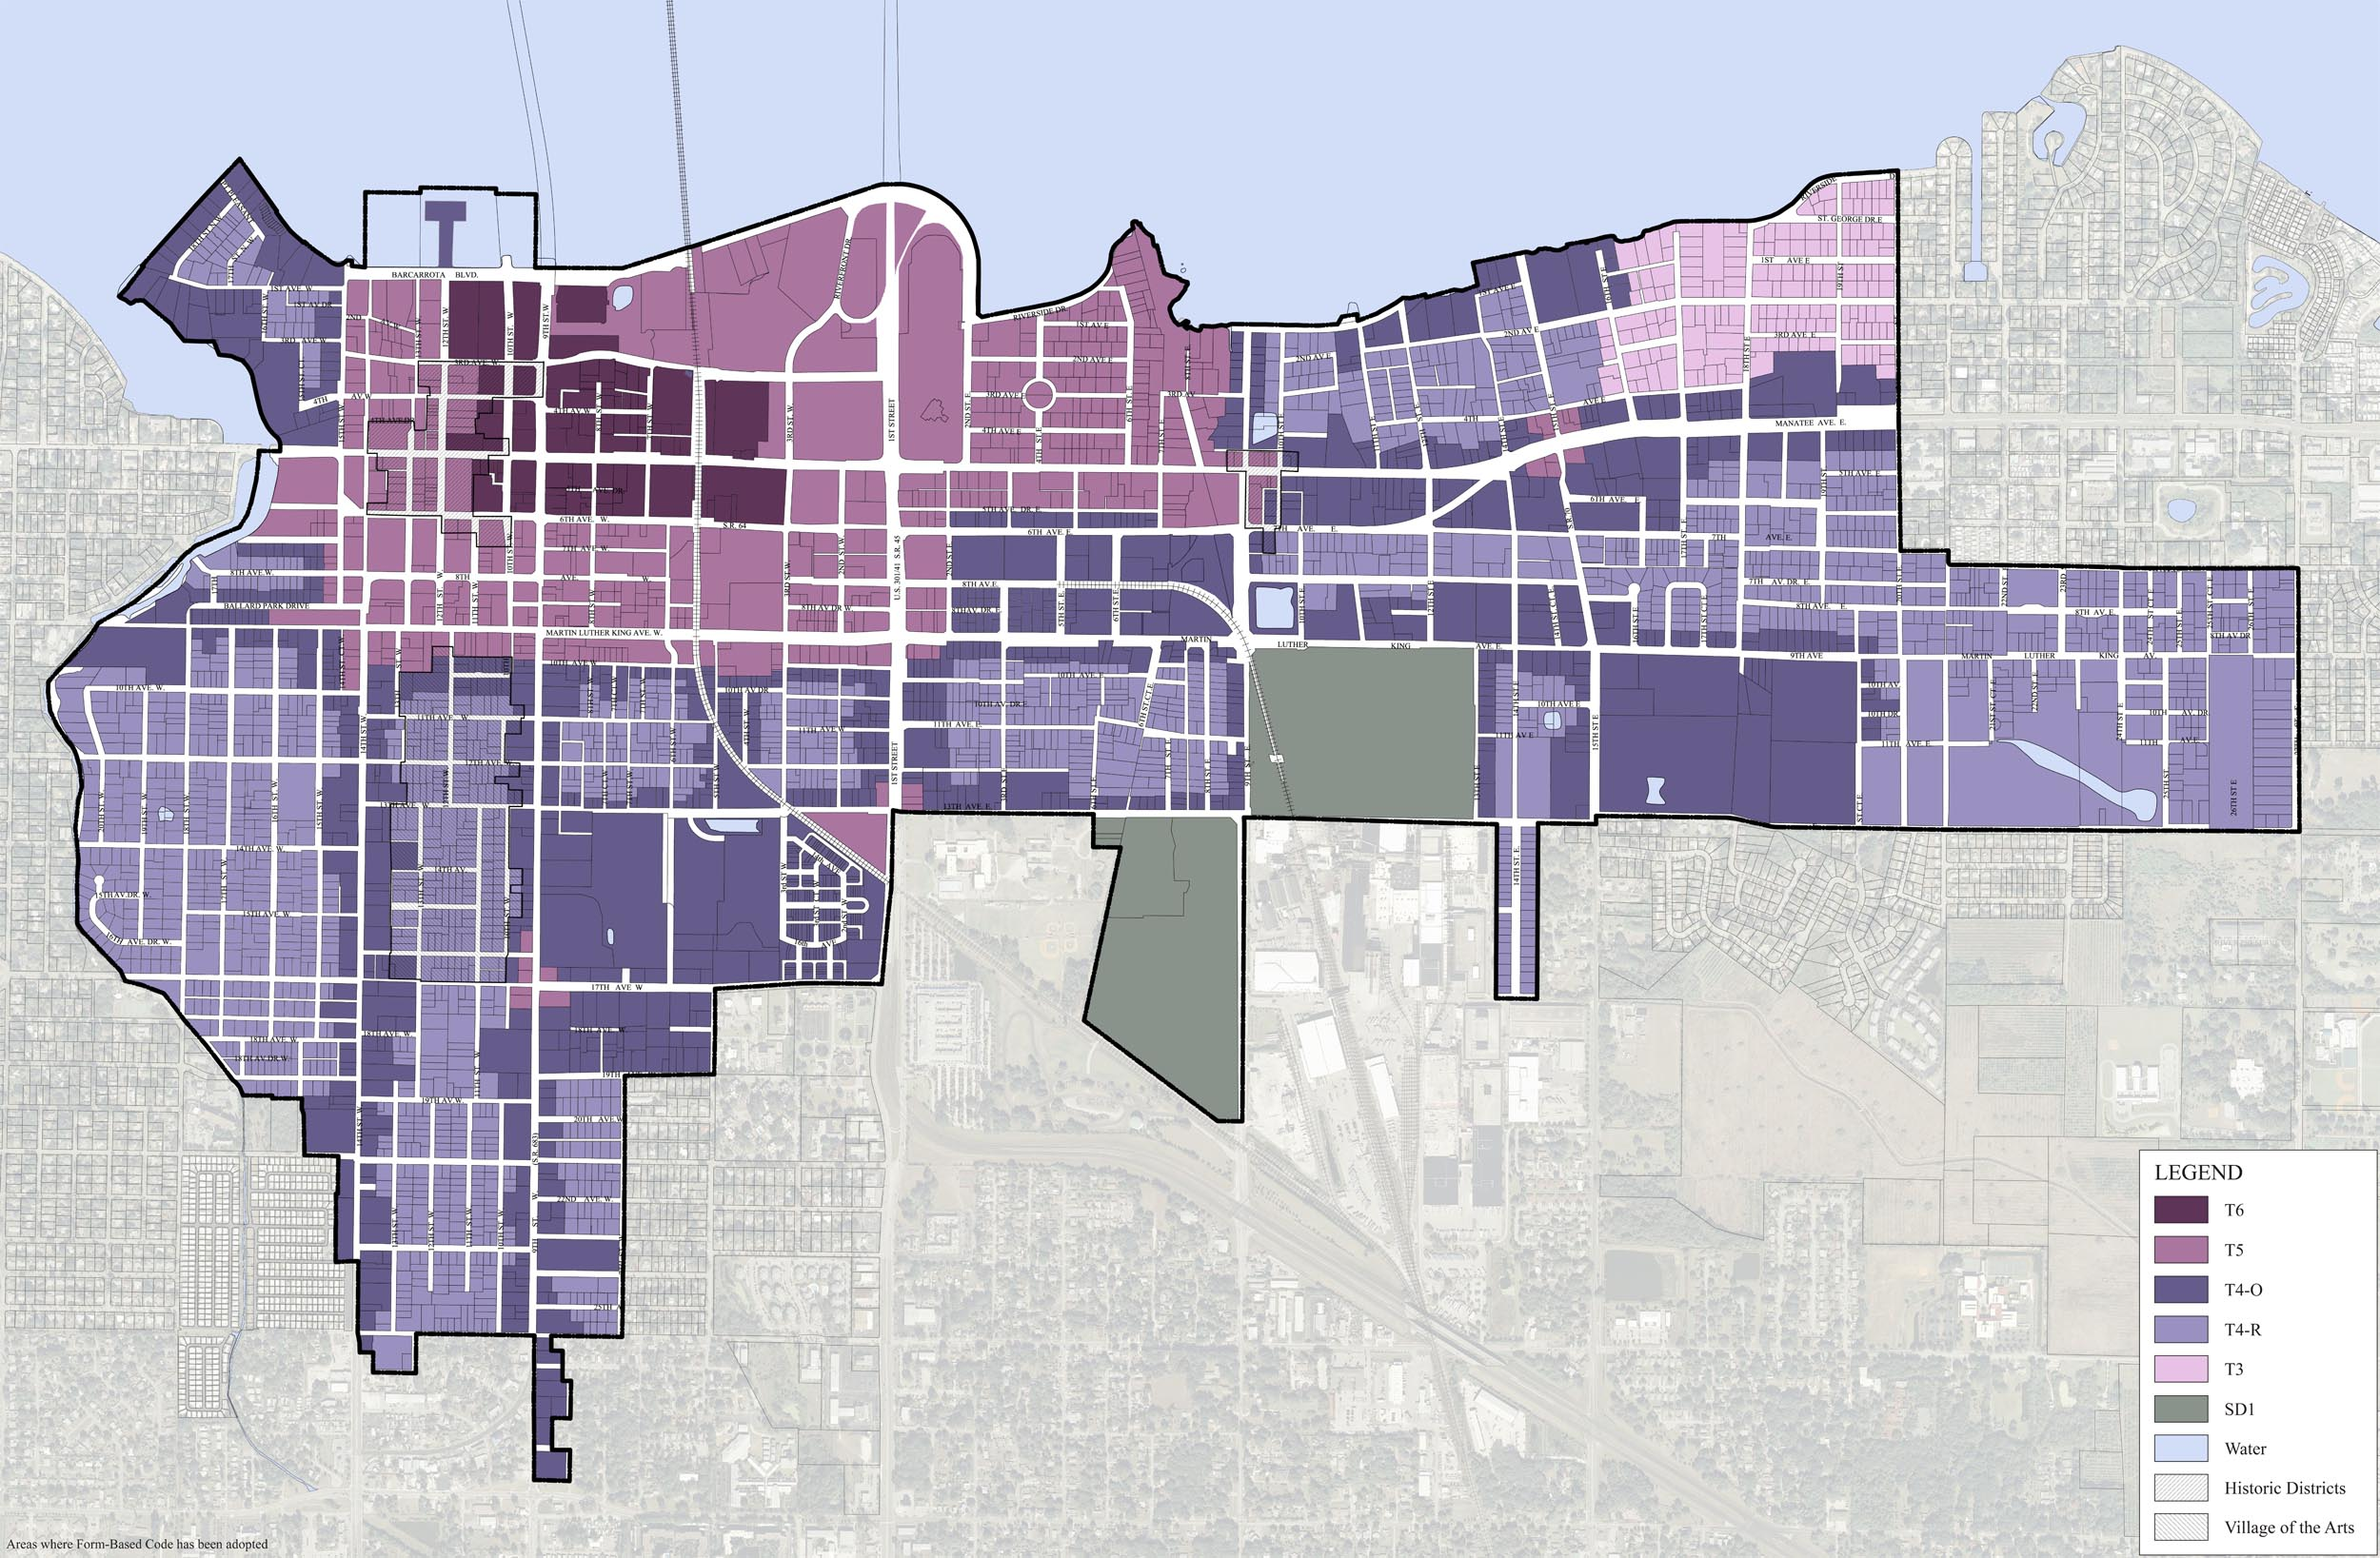 Regulating Plan - Transect Zones